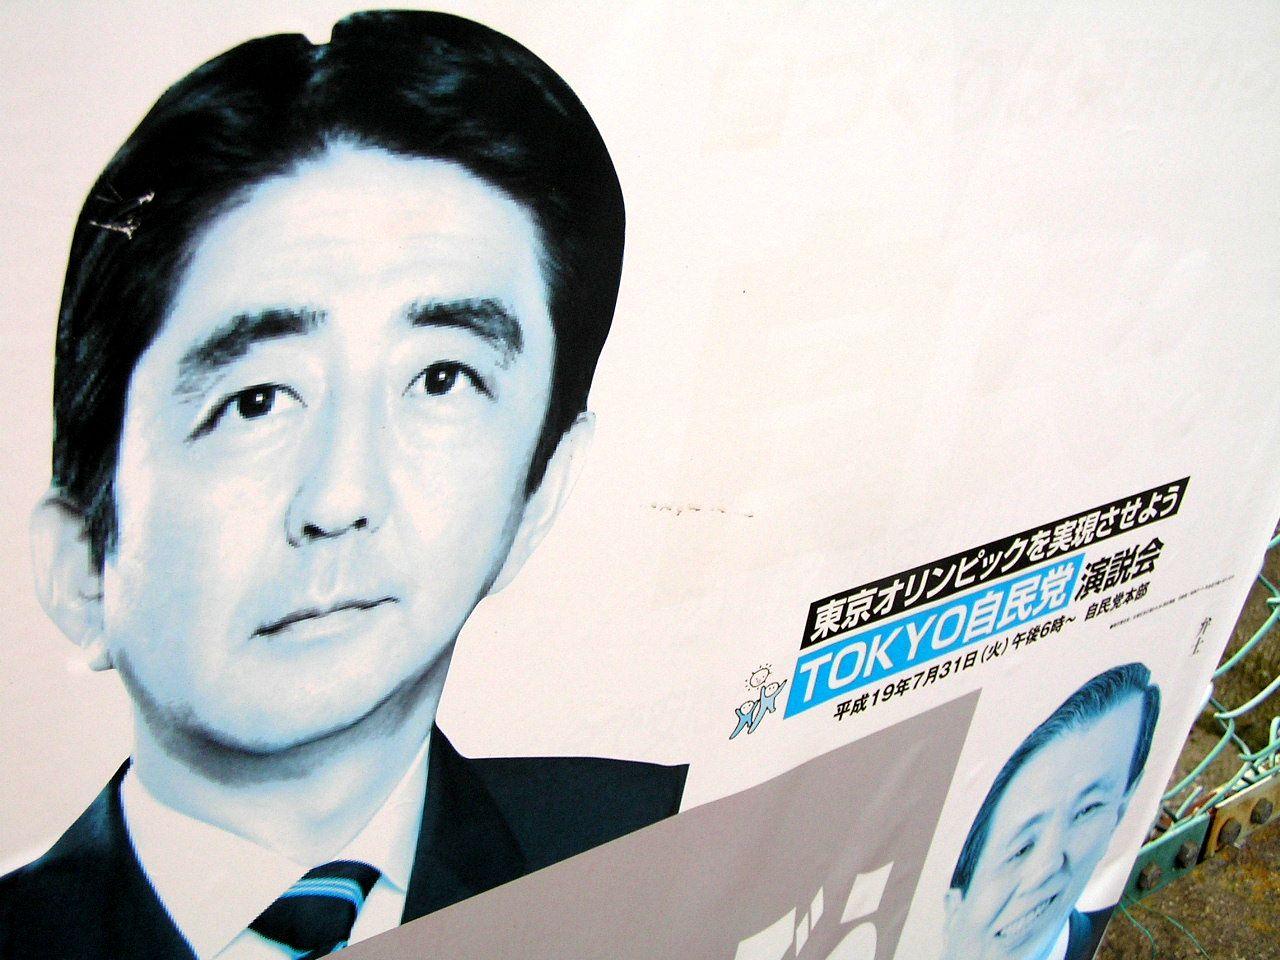 shinzo-abe-economic-reform-abenomics-fukushima-olympics